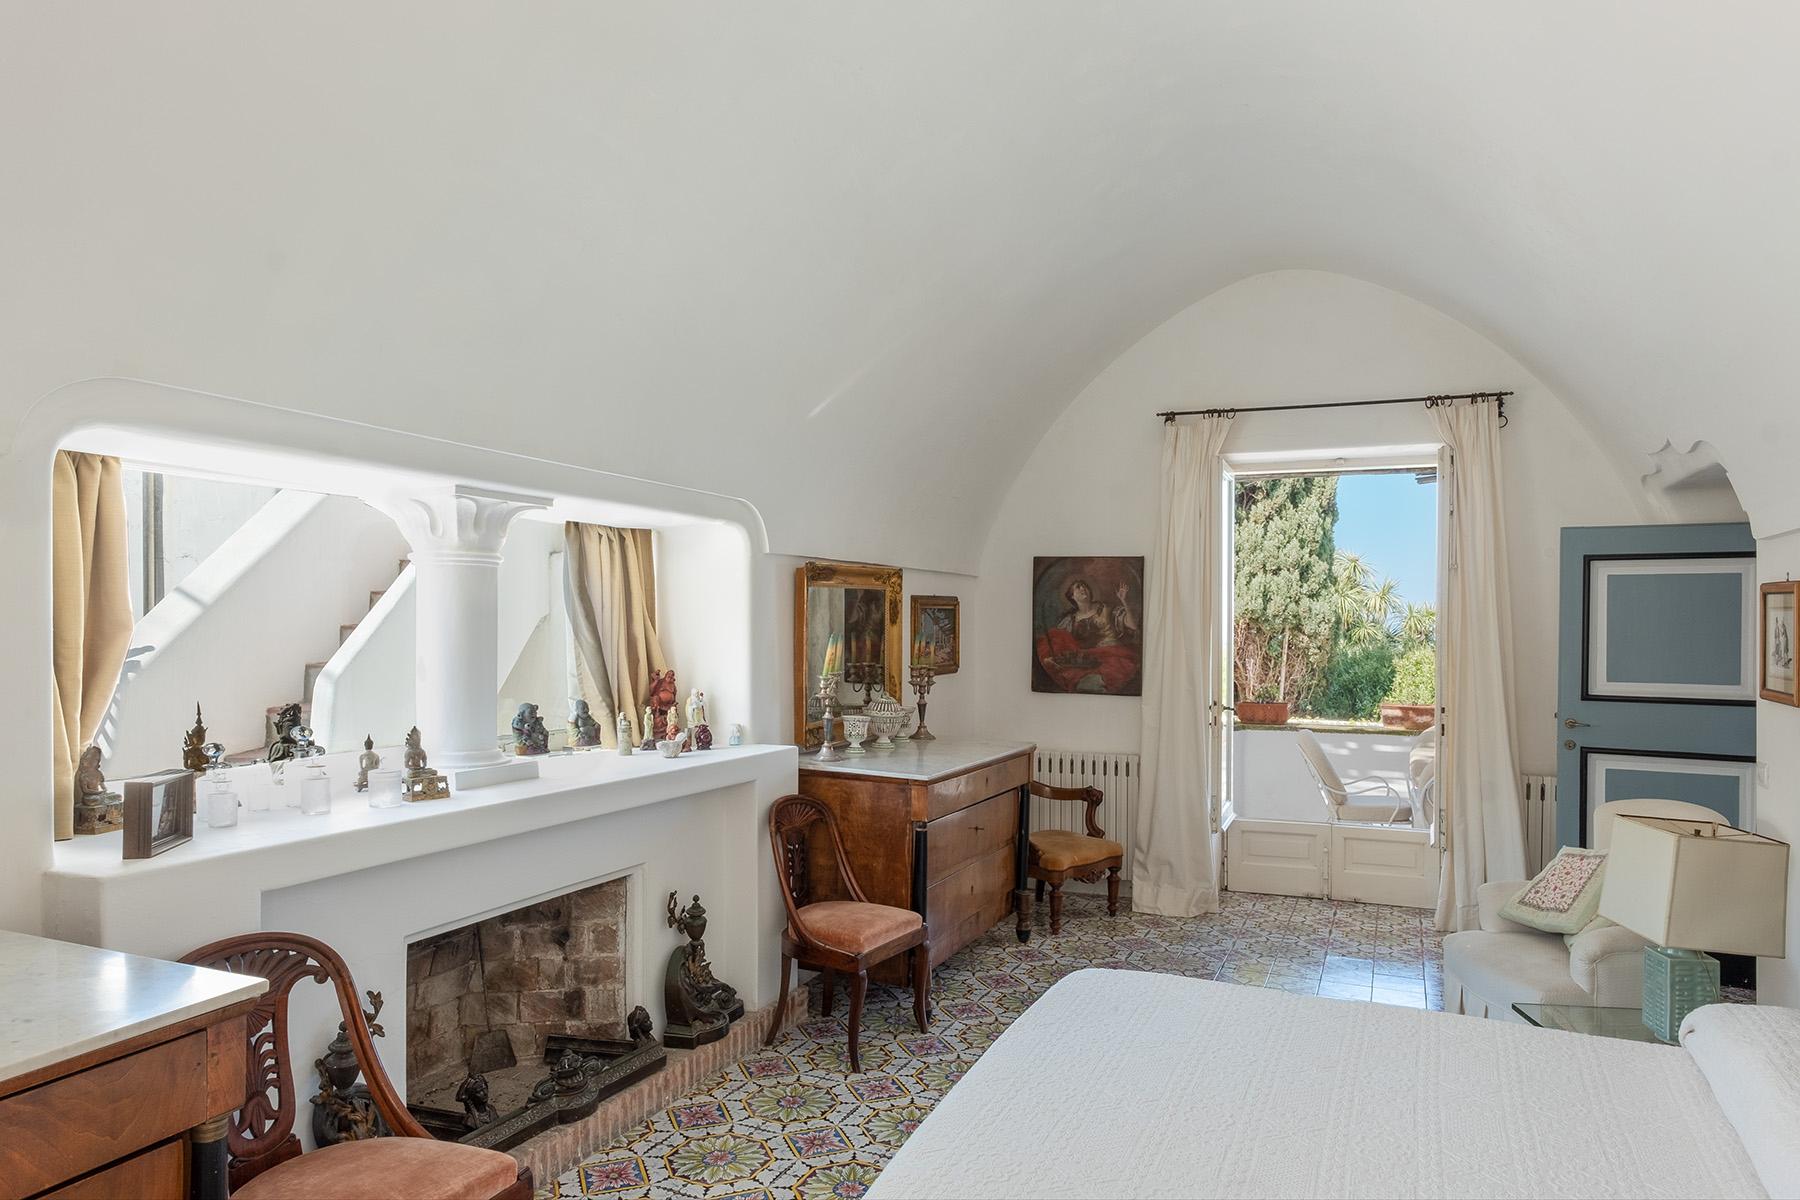 Casa indipendente in Vendita a Capri: 5 locali, 300 mq - Foto 16